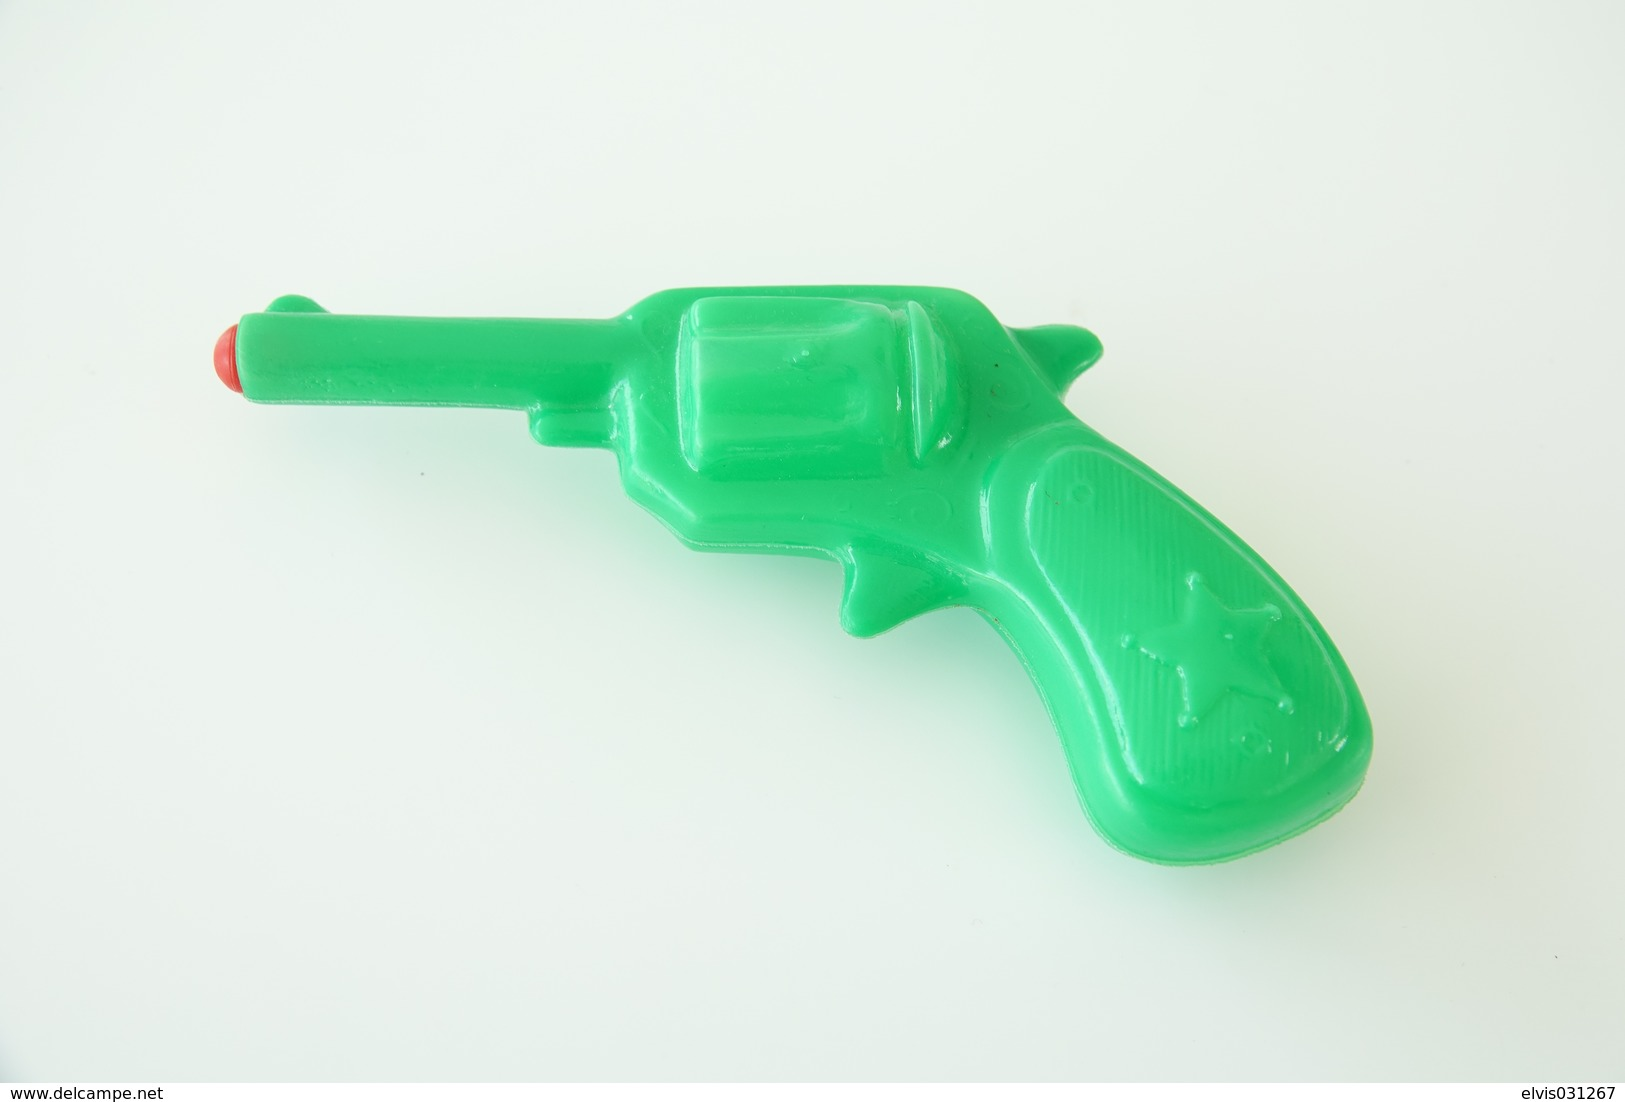 Vintage TOY GUN : PLASTIC REVOLVER GREEN - L=15cm - 1950s - Keywords : Cap - Cork Gun - Rifle - Revolver - Pistol - - Decotatieve Wapens